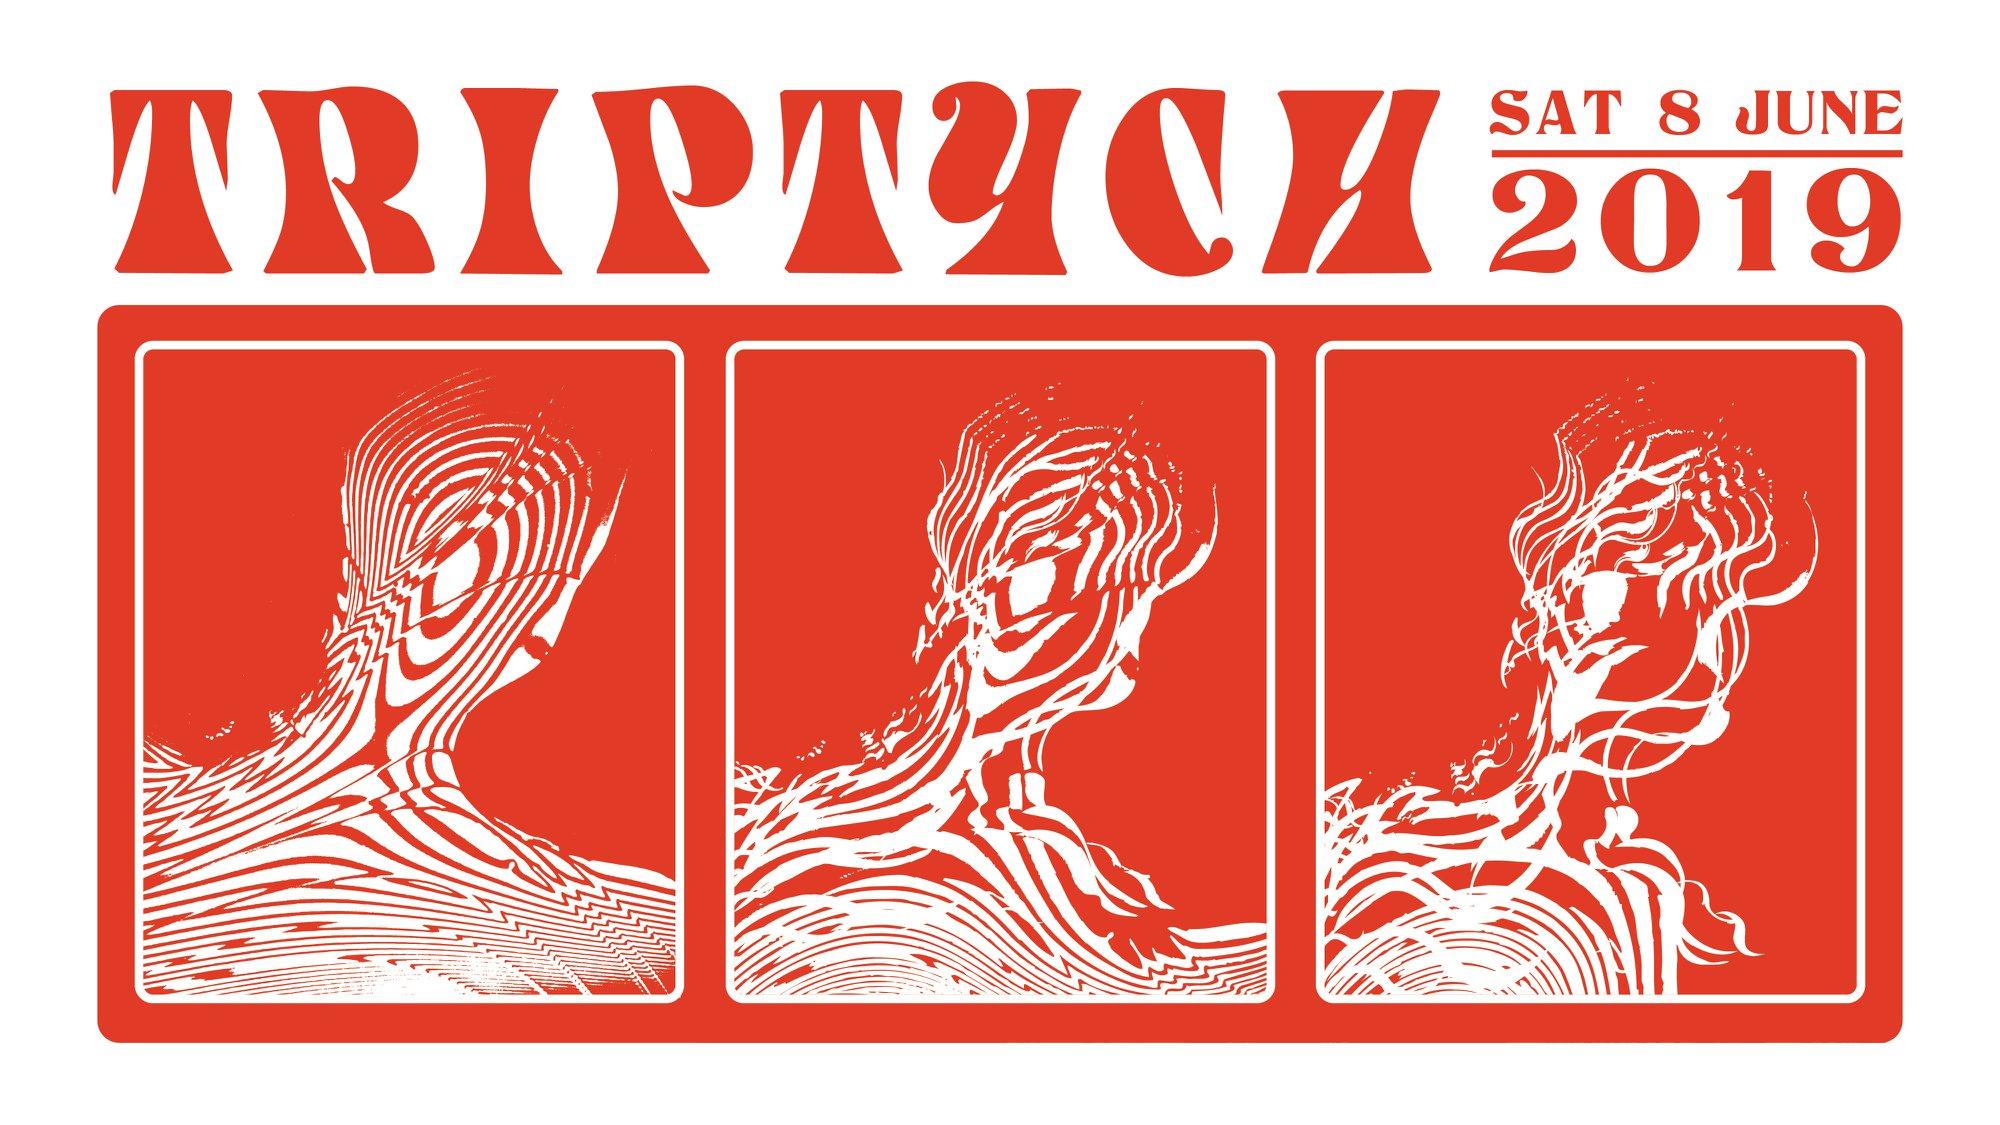 triptychart.jpg